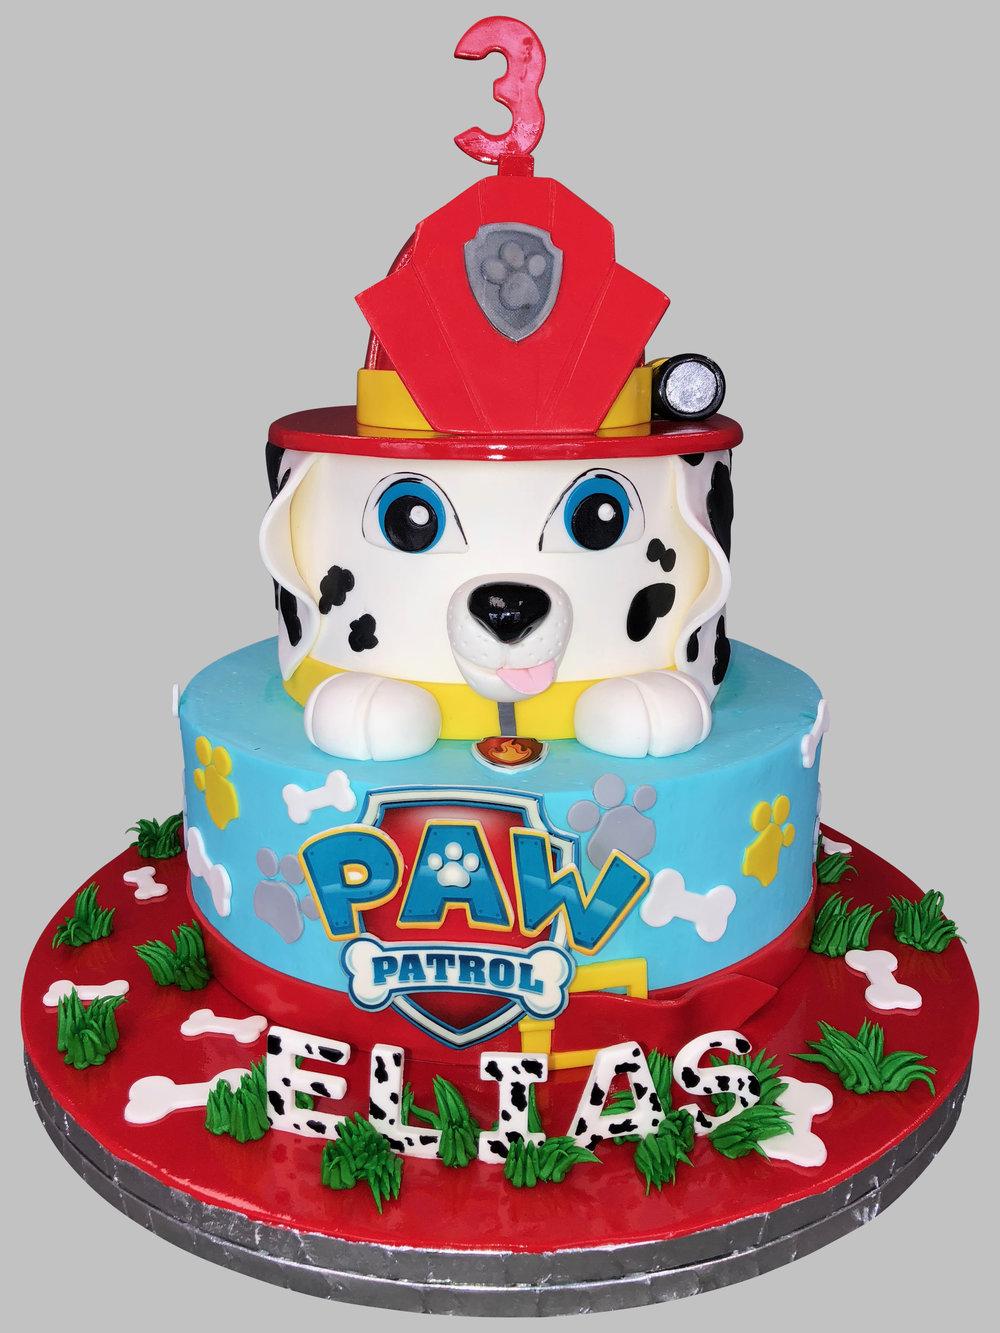 Paw Patrol Birthday Cake New Jersey